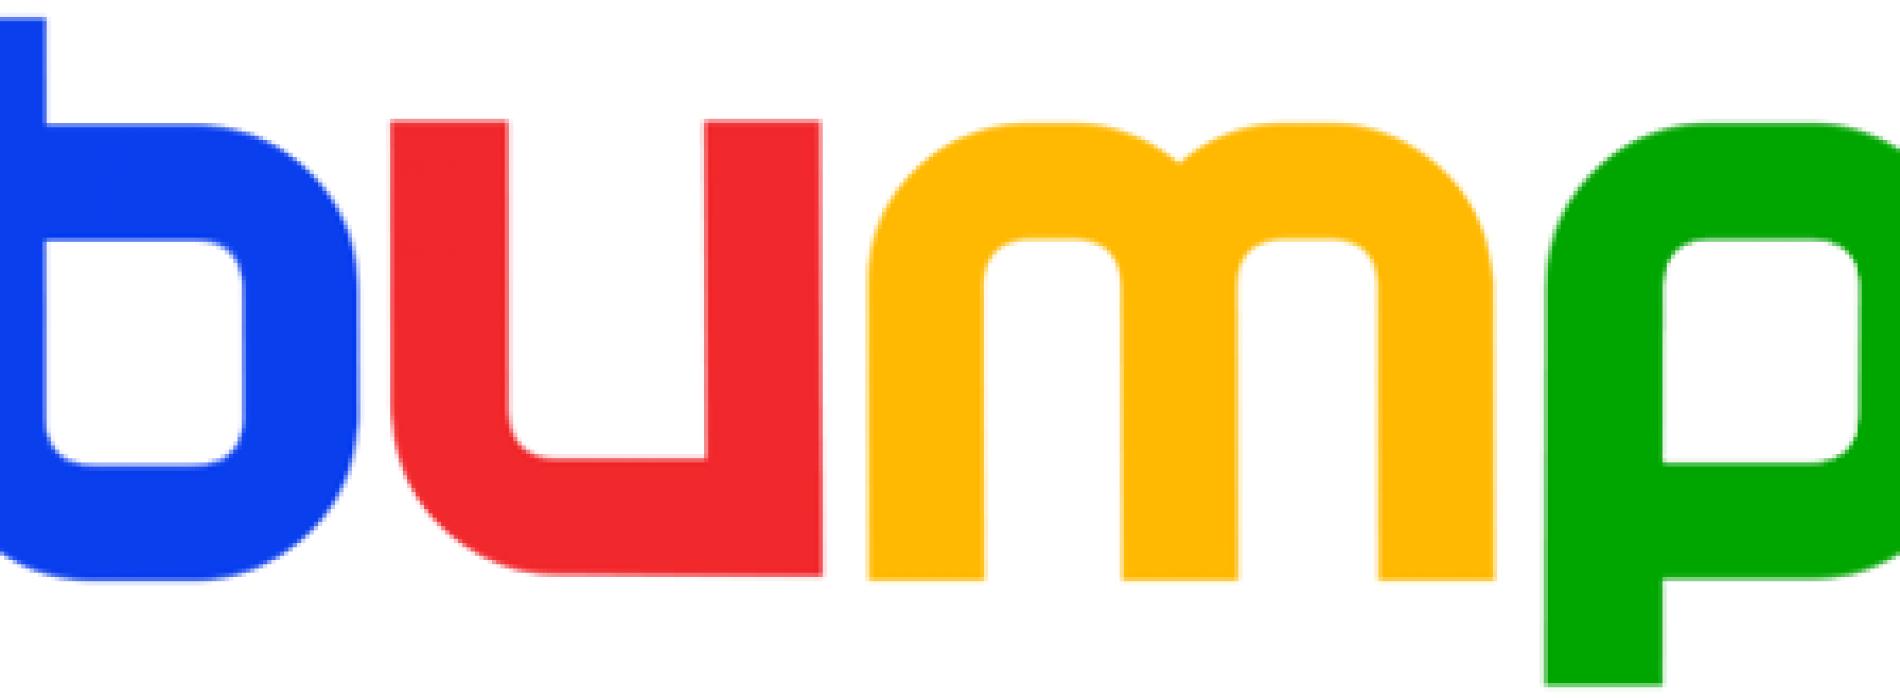 Google acquires sharing app Bump